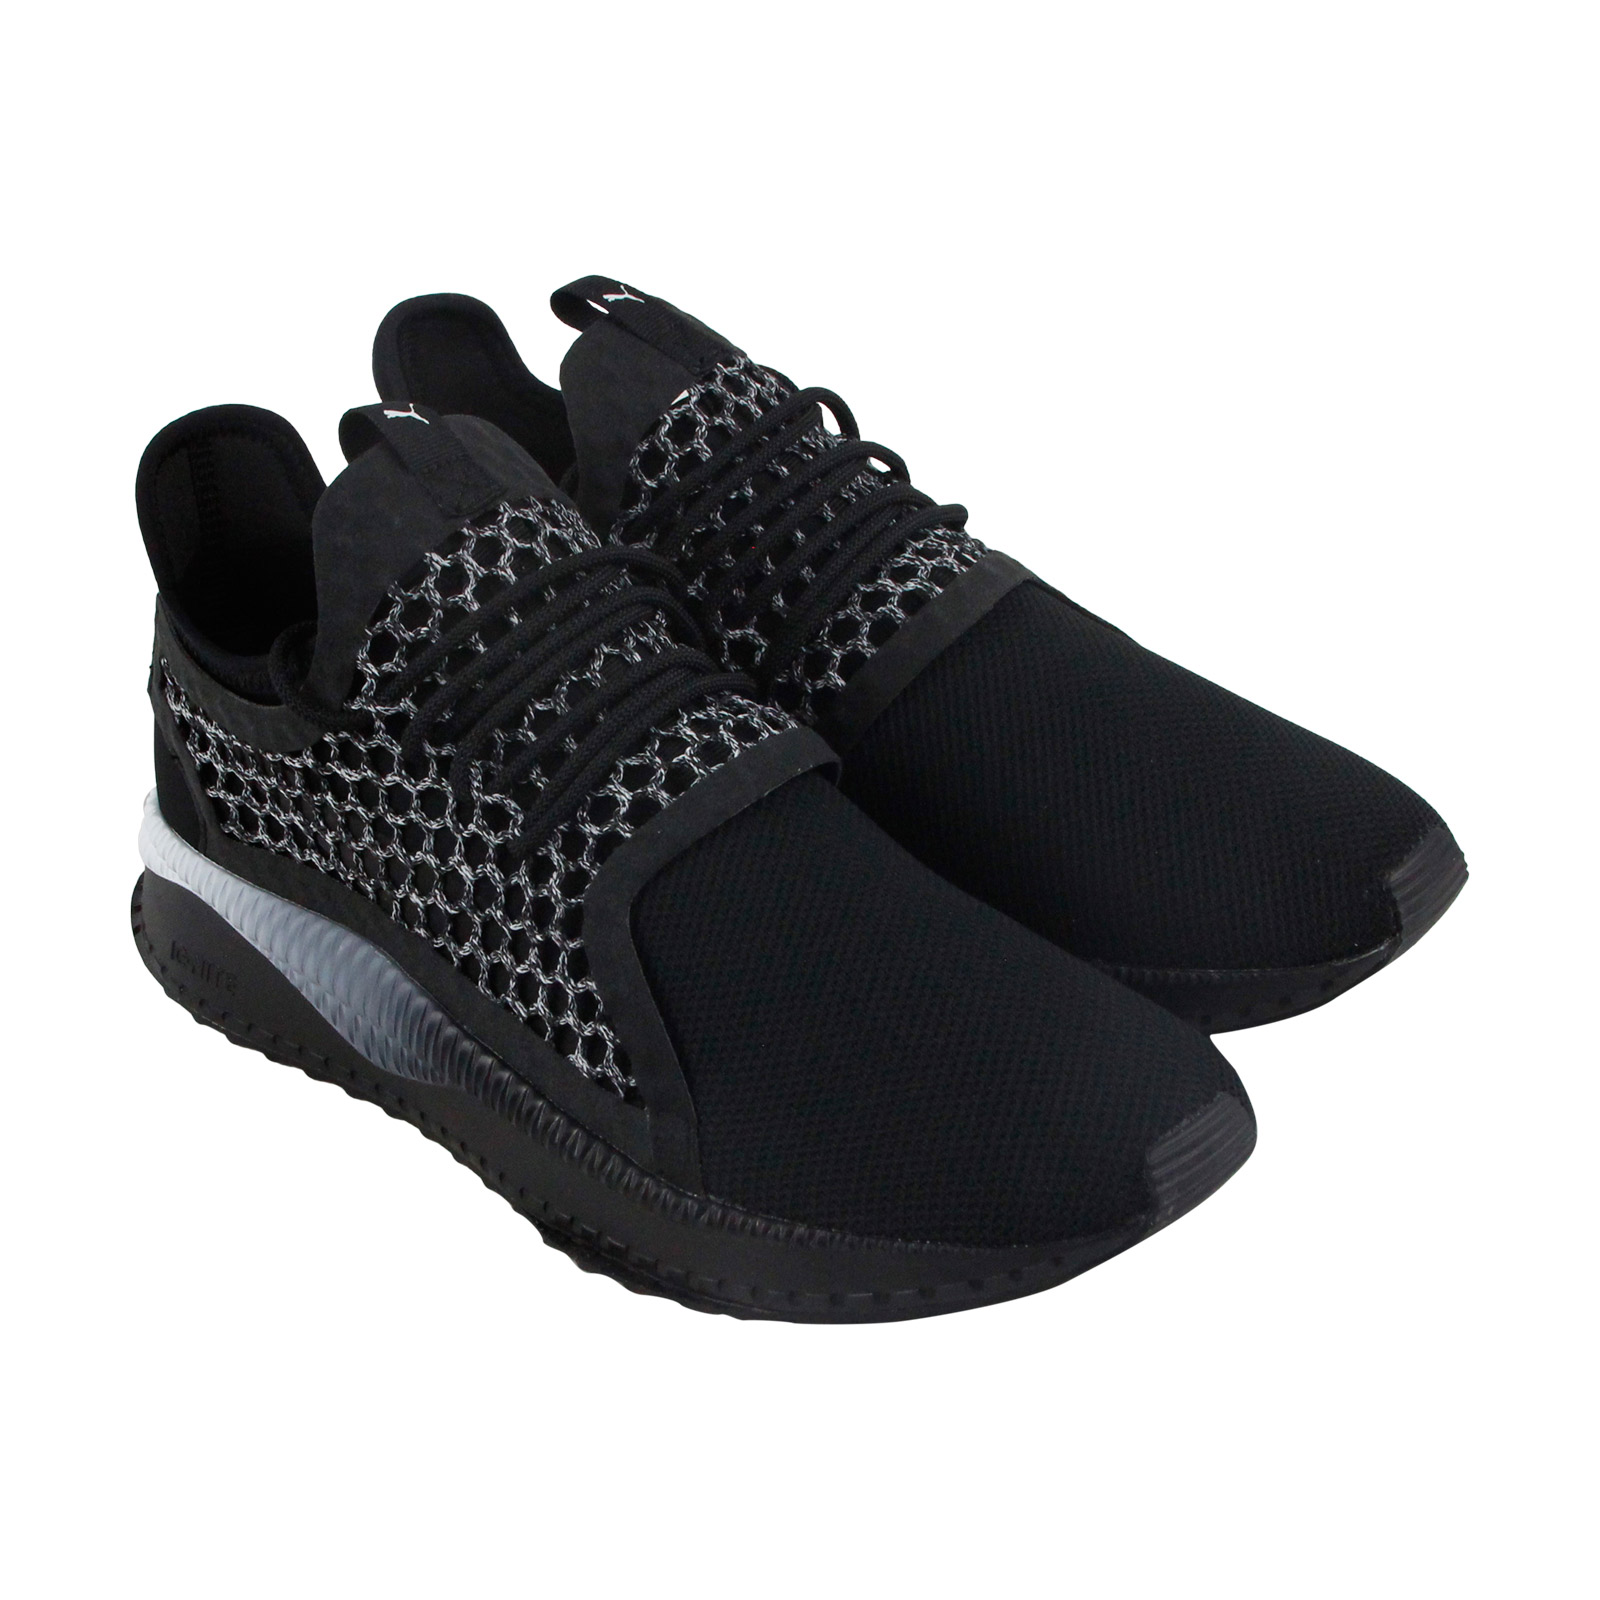 Puma Tsugi Netfit V2 Mens Black Mesh Athletic Lace Up Running Shoes